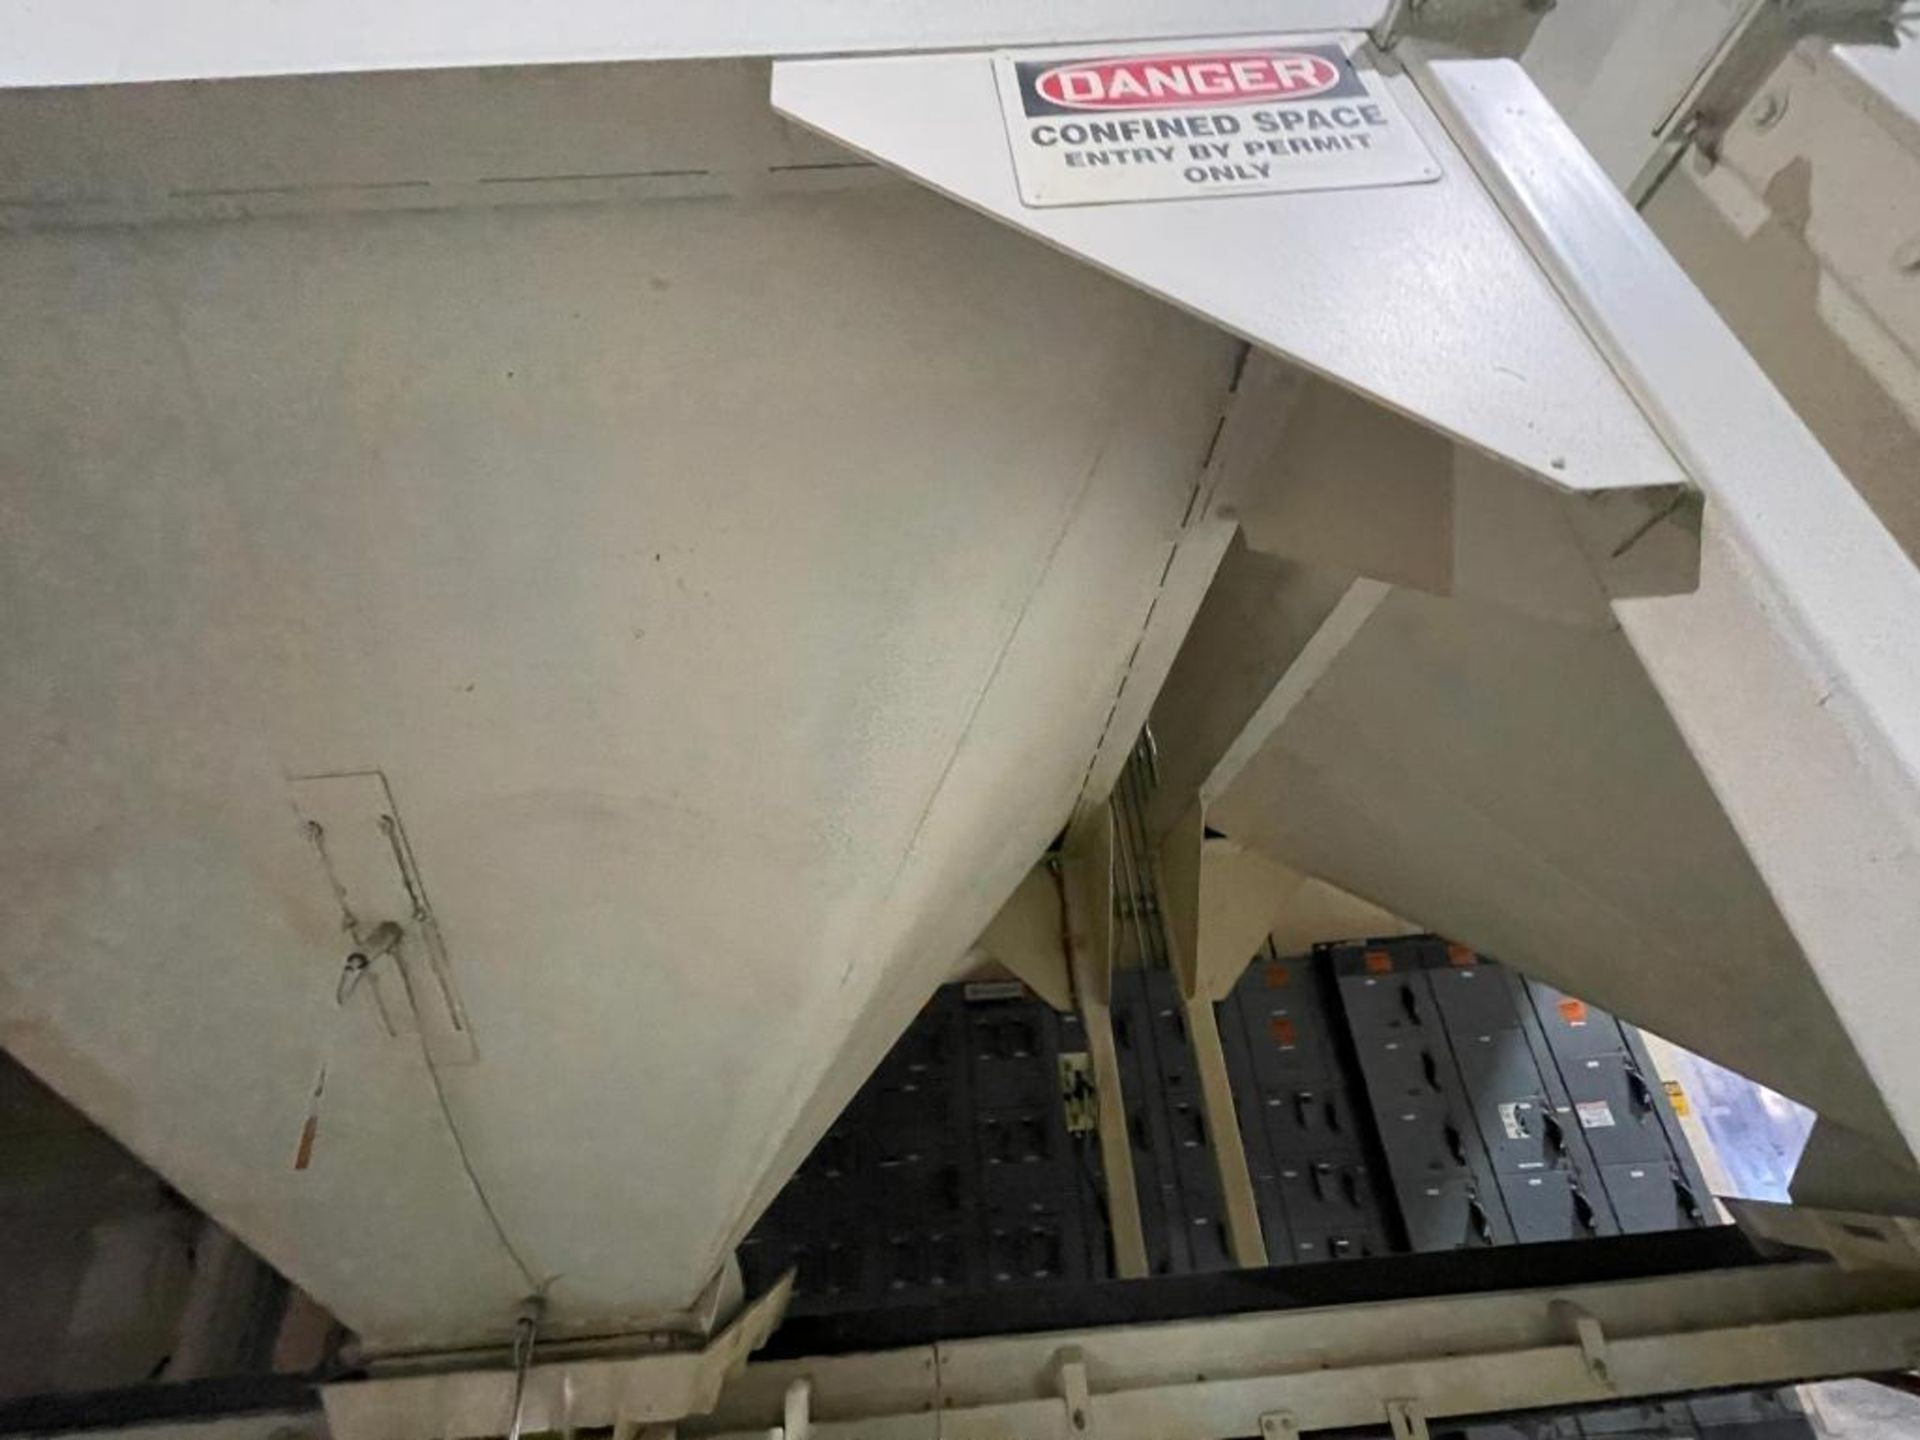 Aseeco mild steel cone bottom bulk storage bin - Image 8 of 31